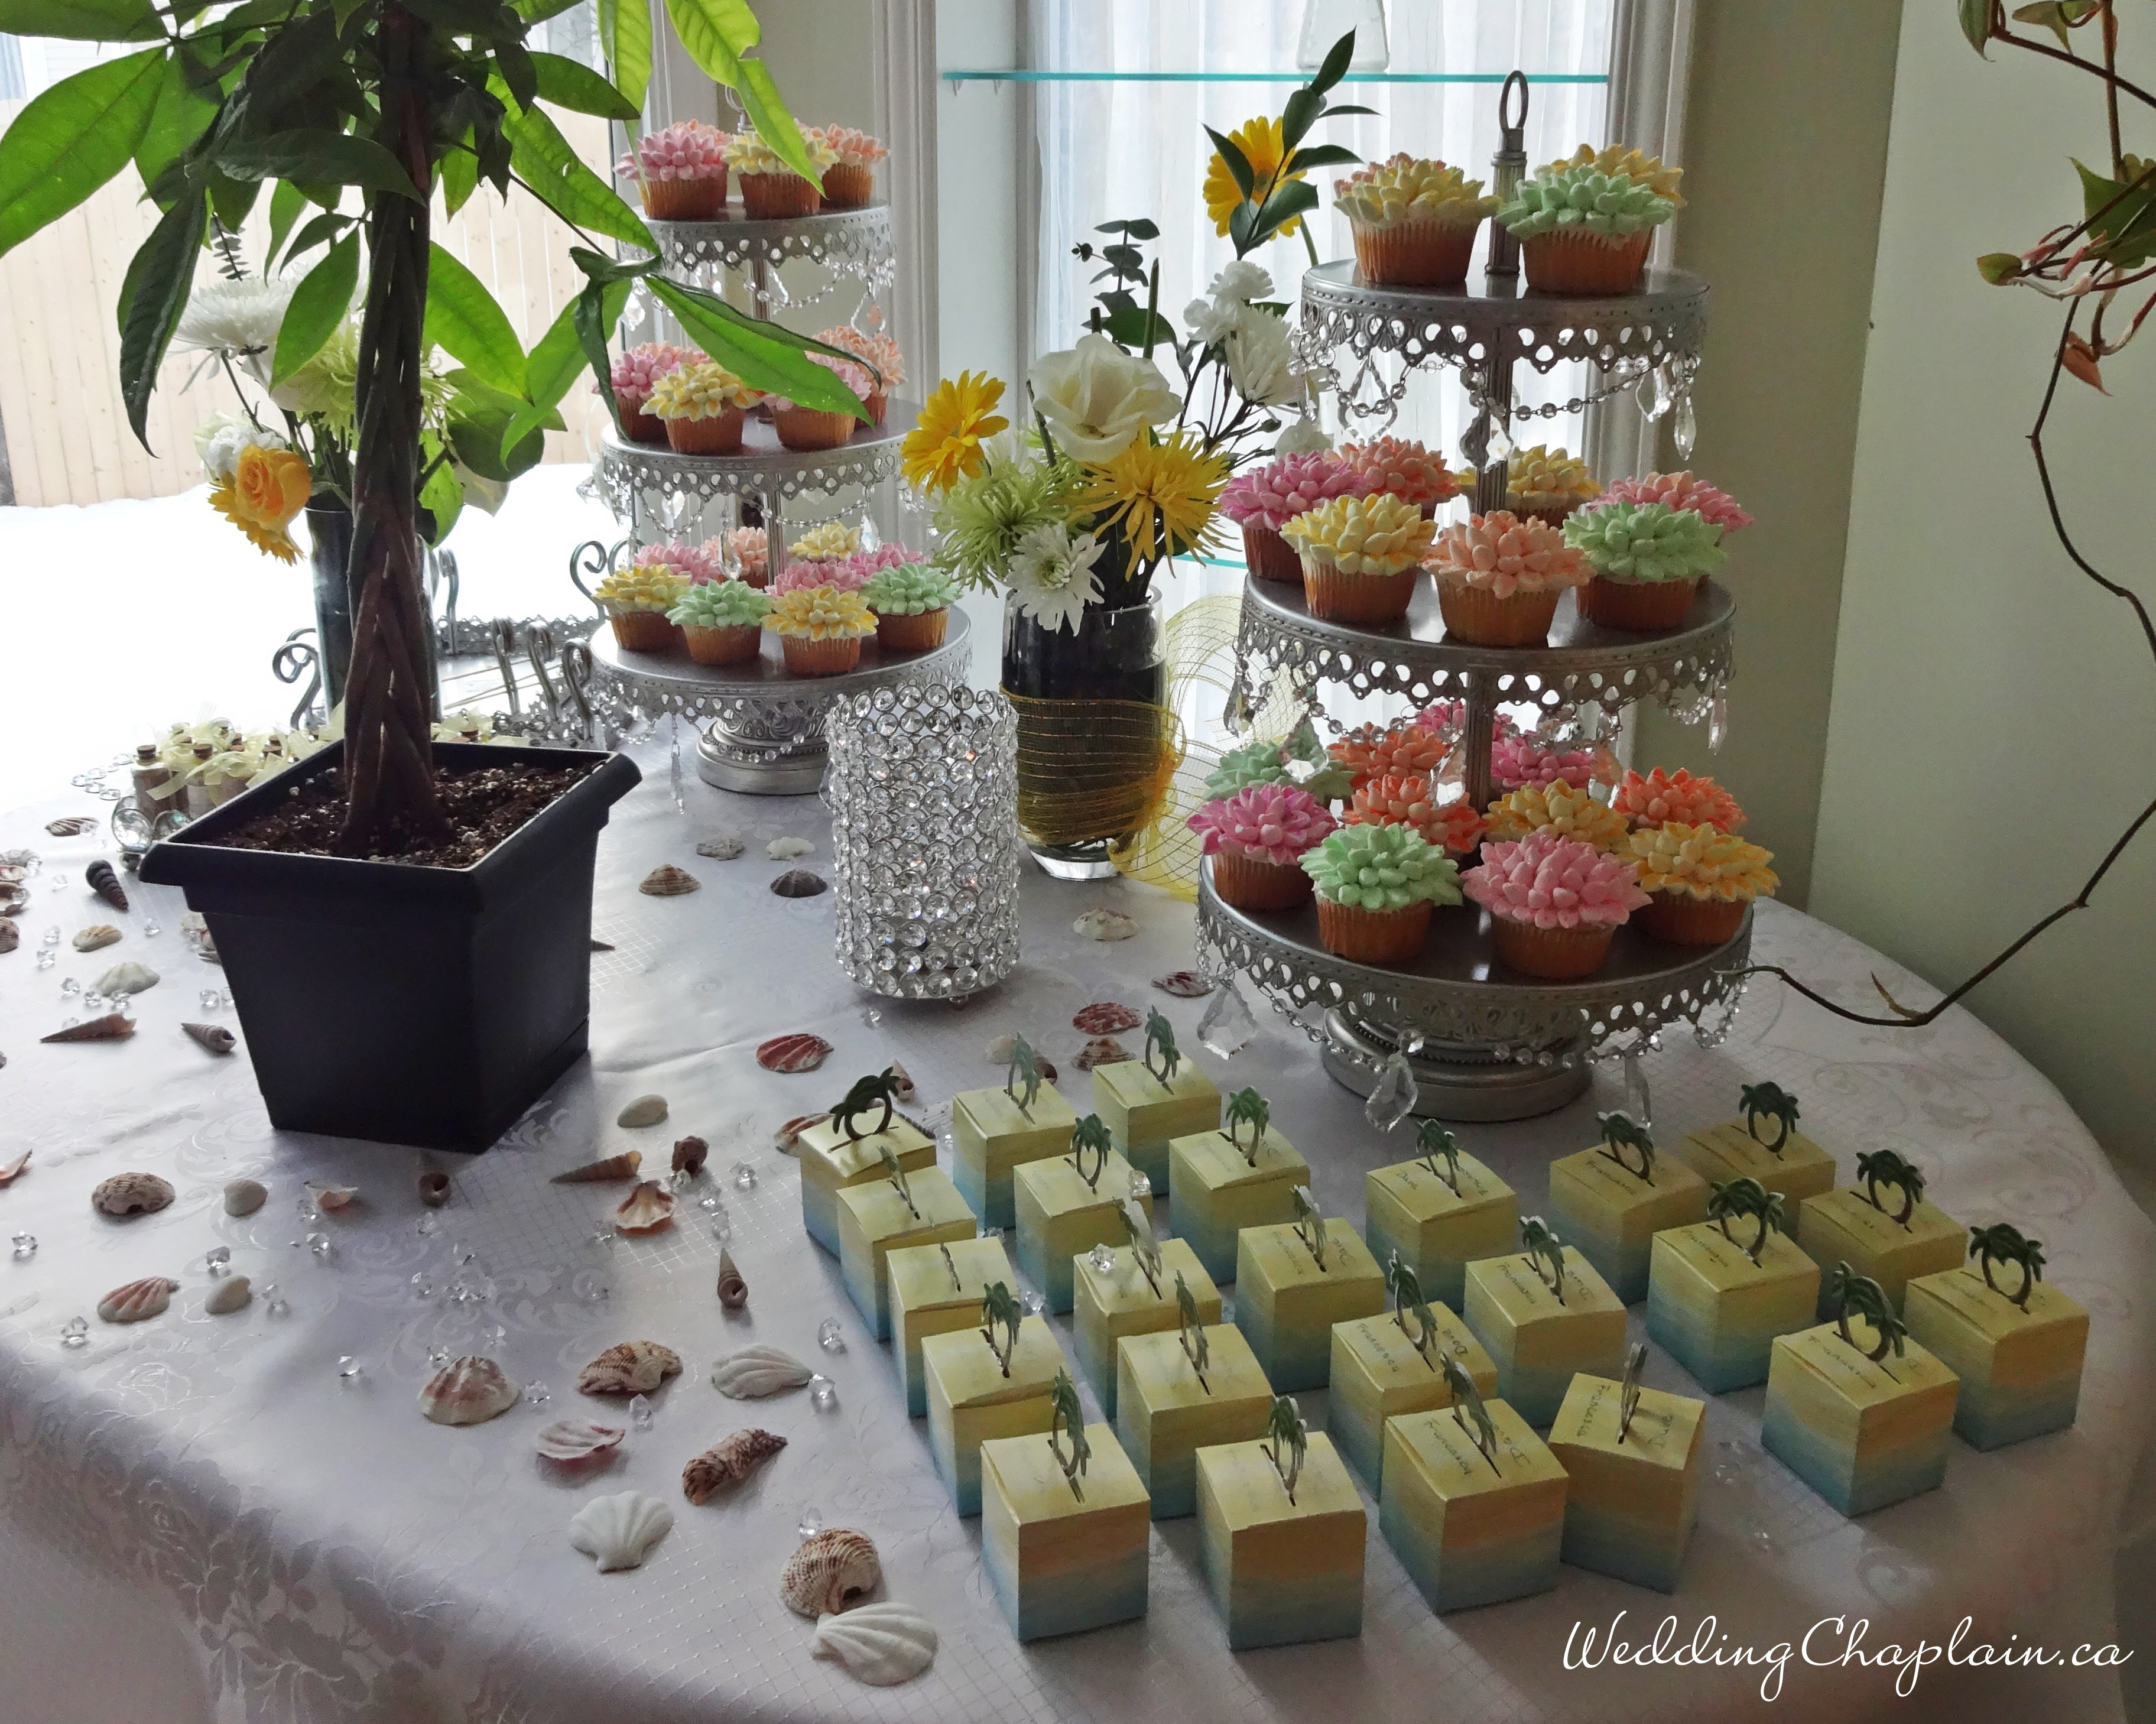 https://www.ottawaweddingmagazine.com/wp-content/uploads/2014/12/cakes2.jpg